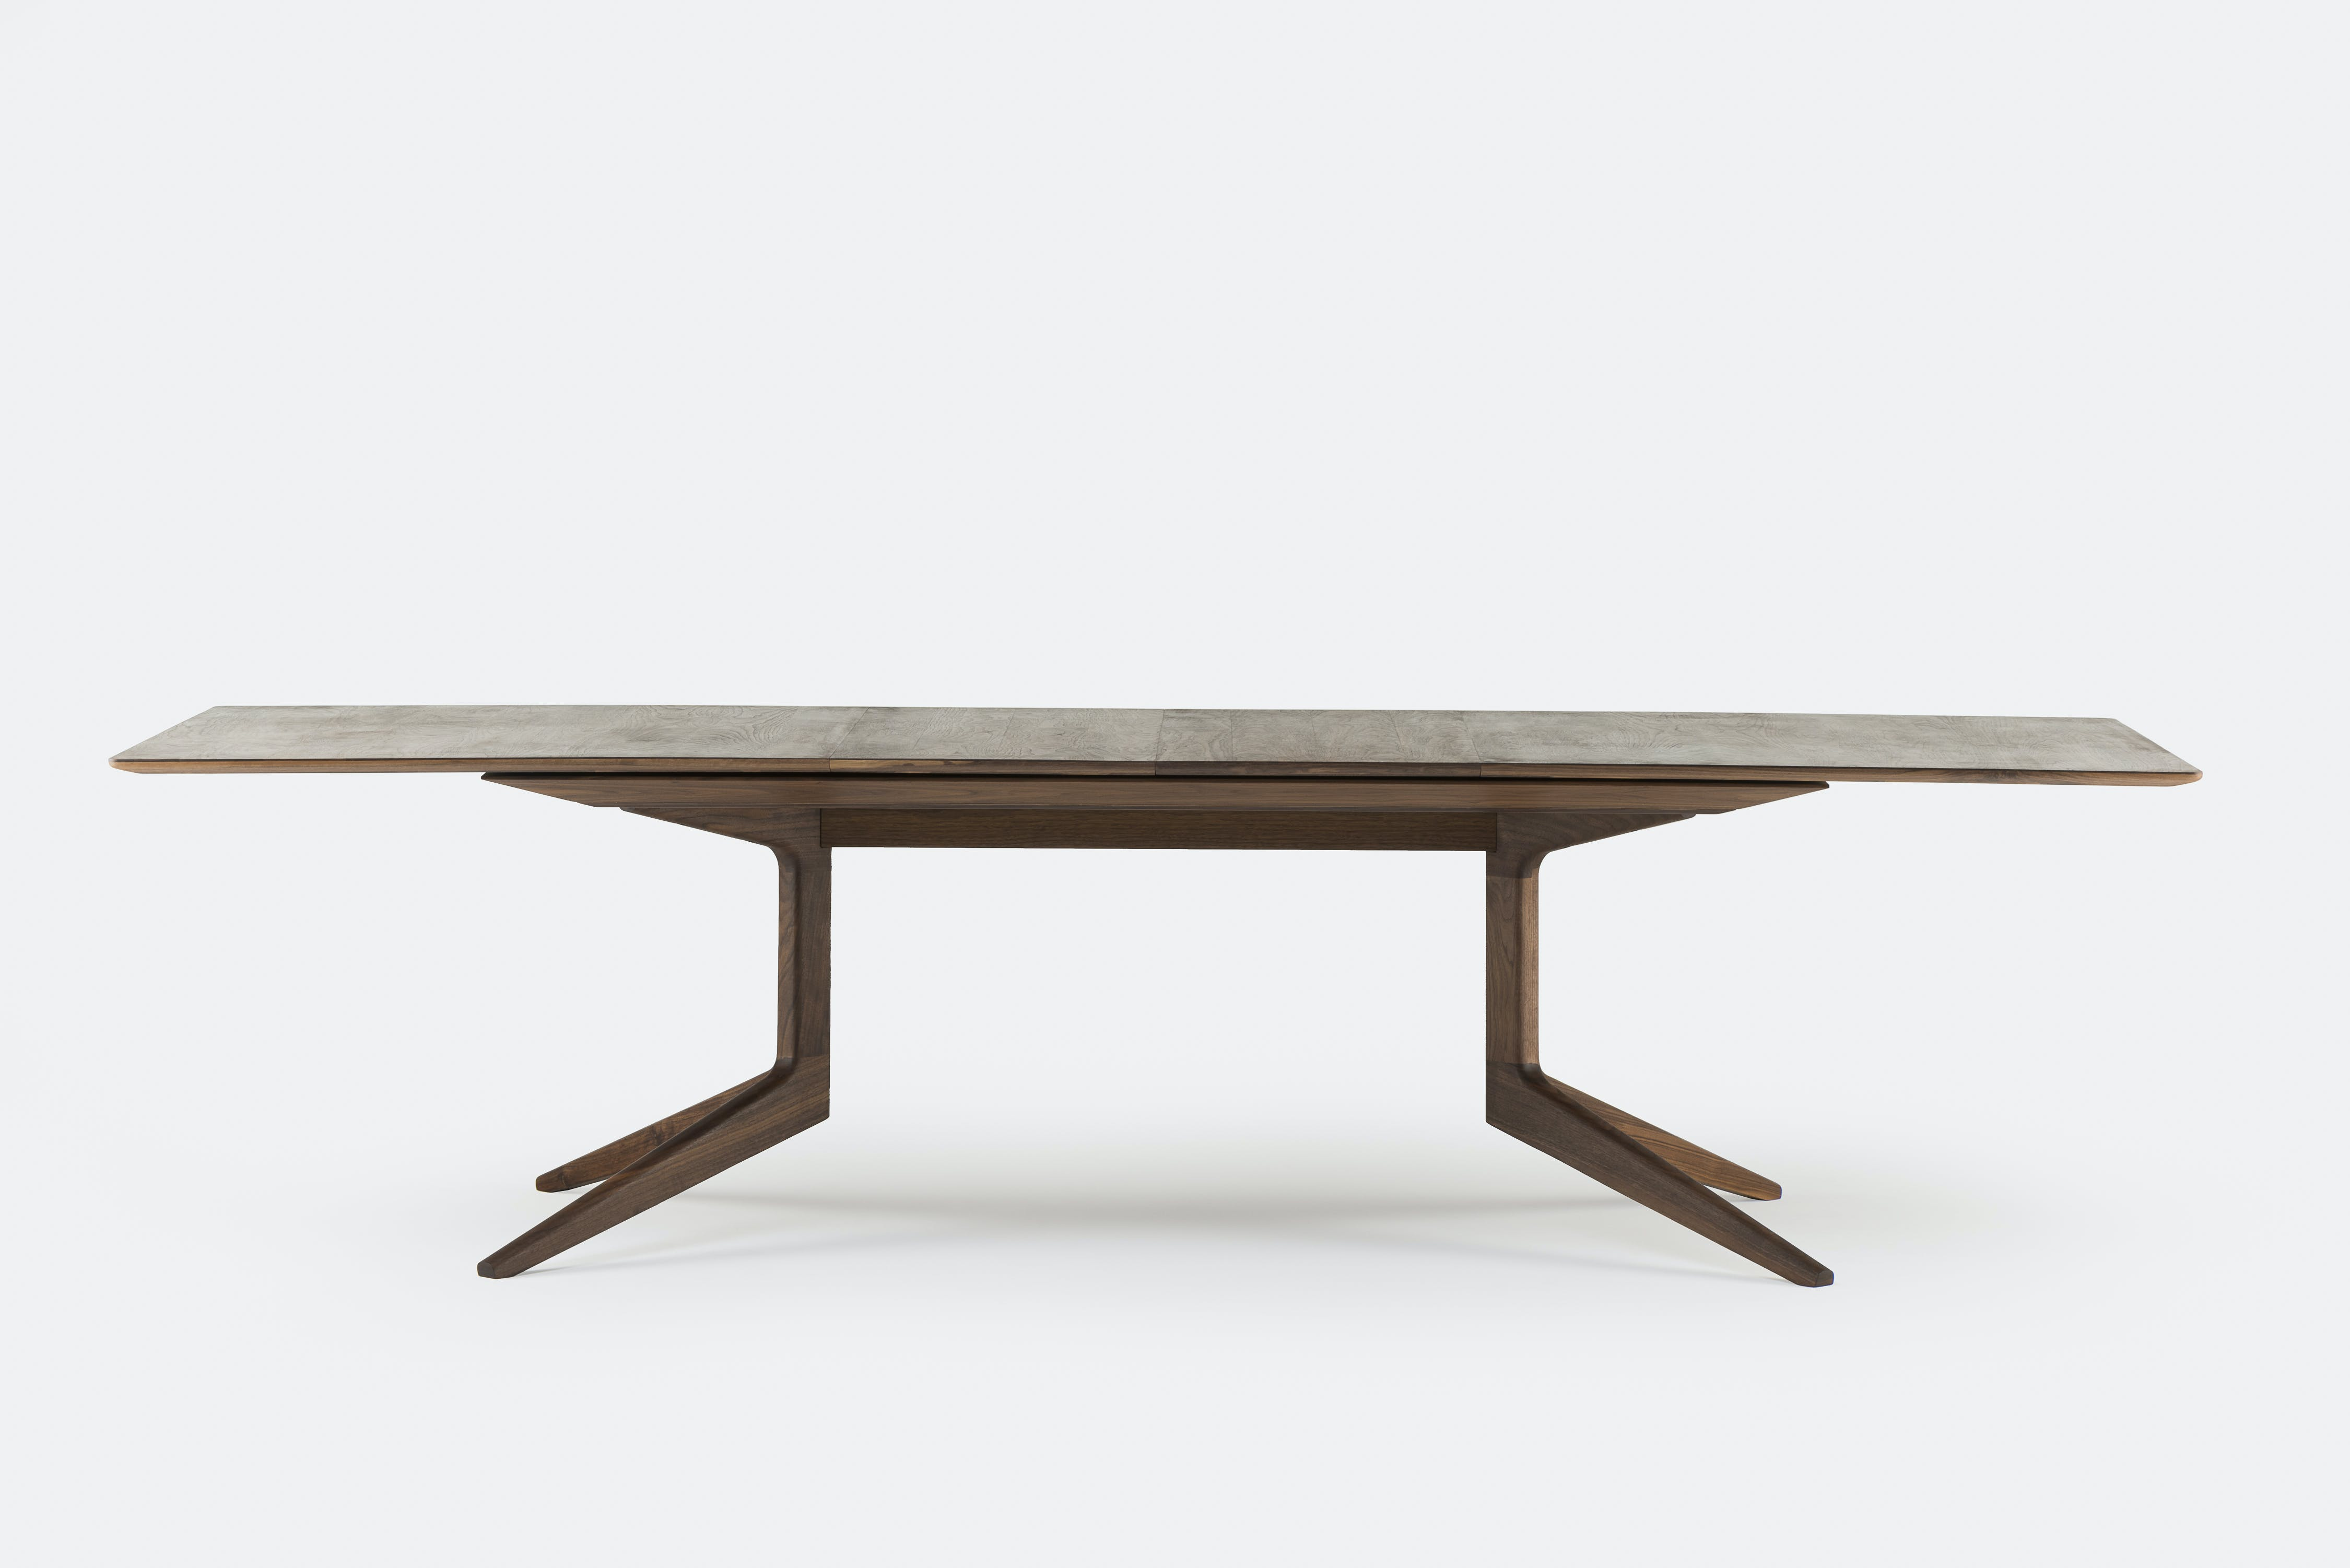 De La Espada Matthew Hilton Light Extending Table Walnut Large Haute Living